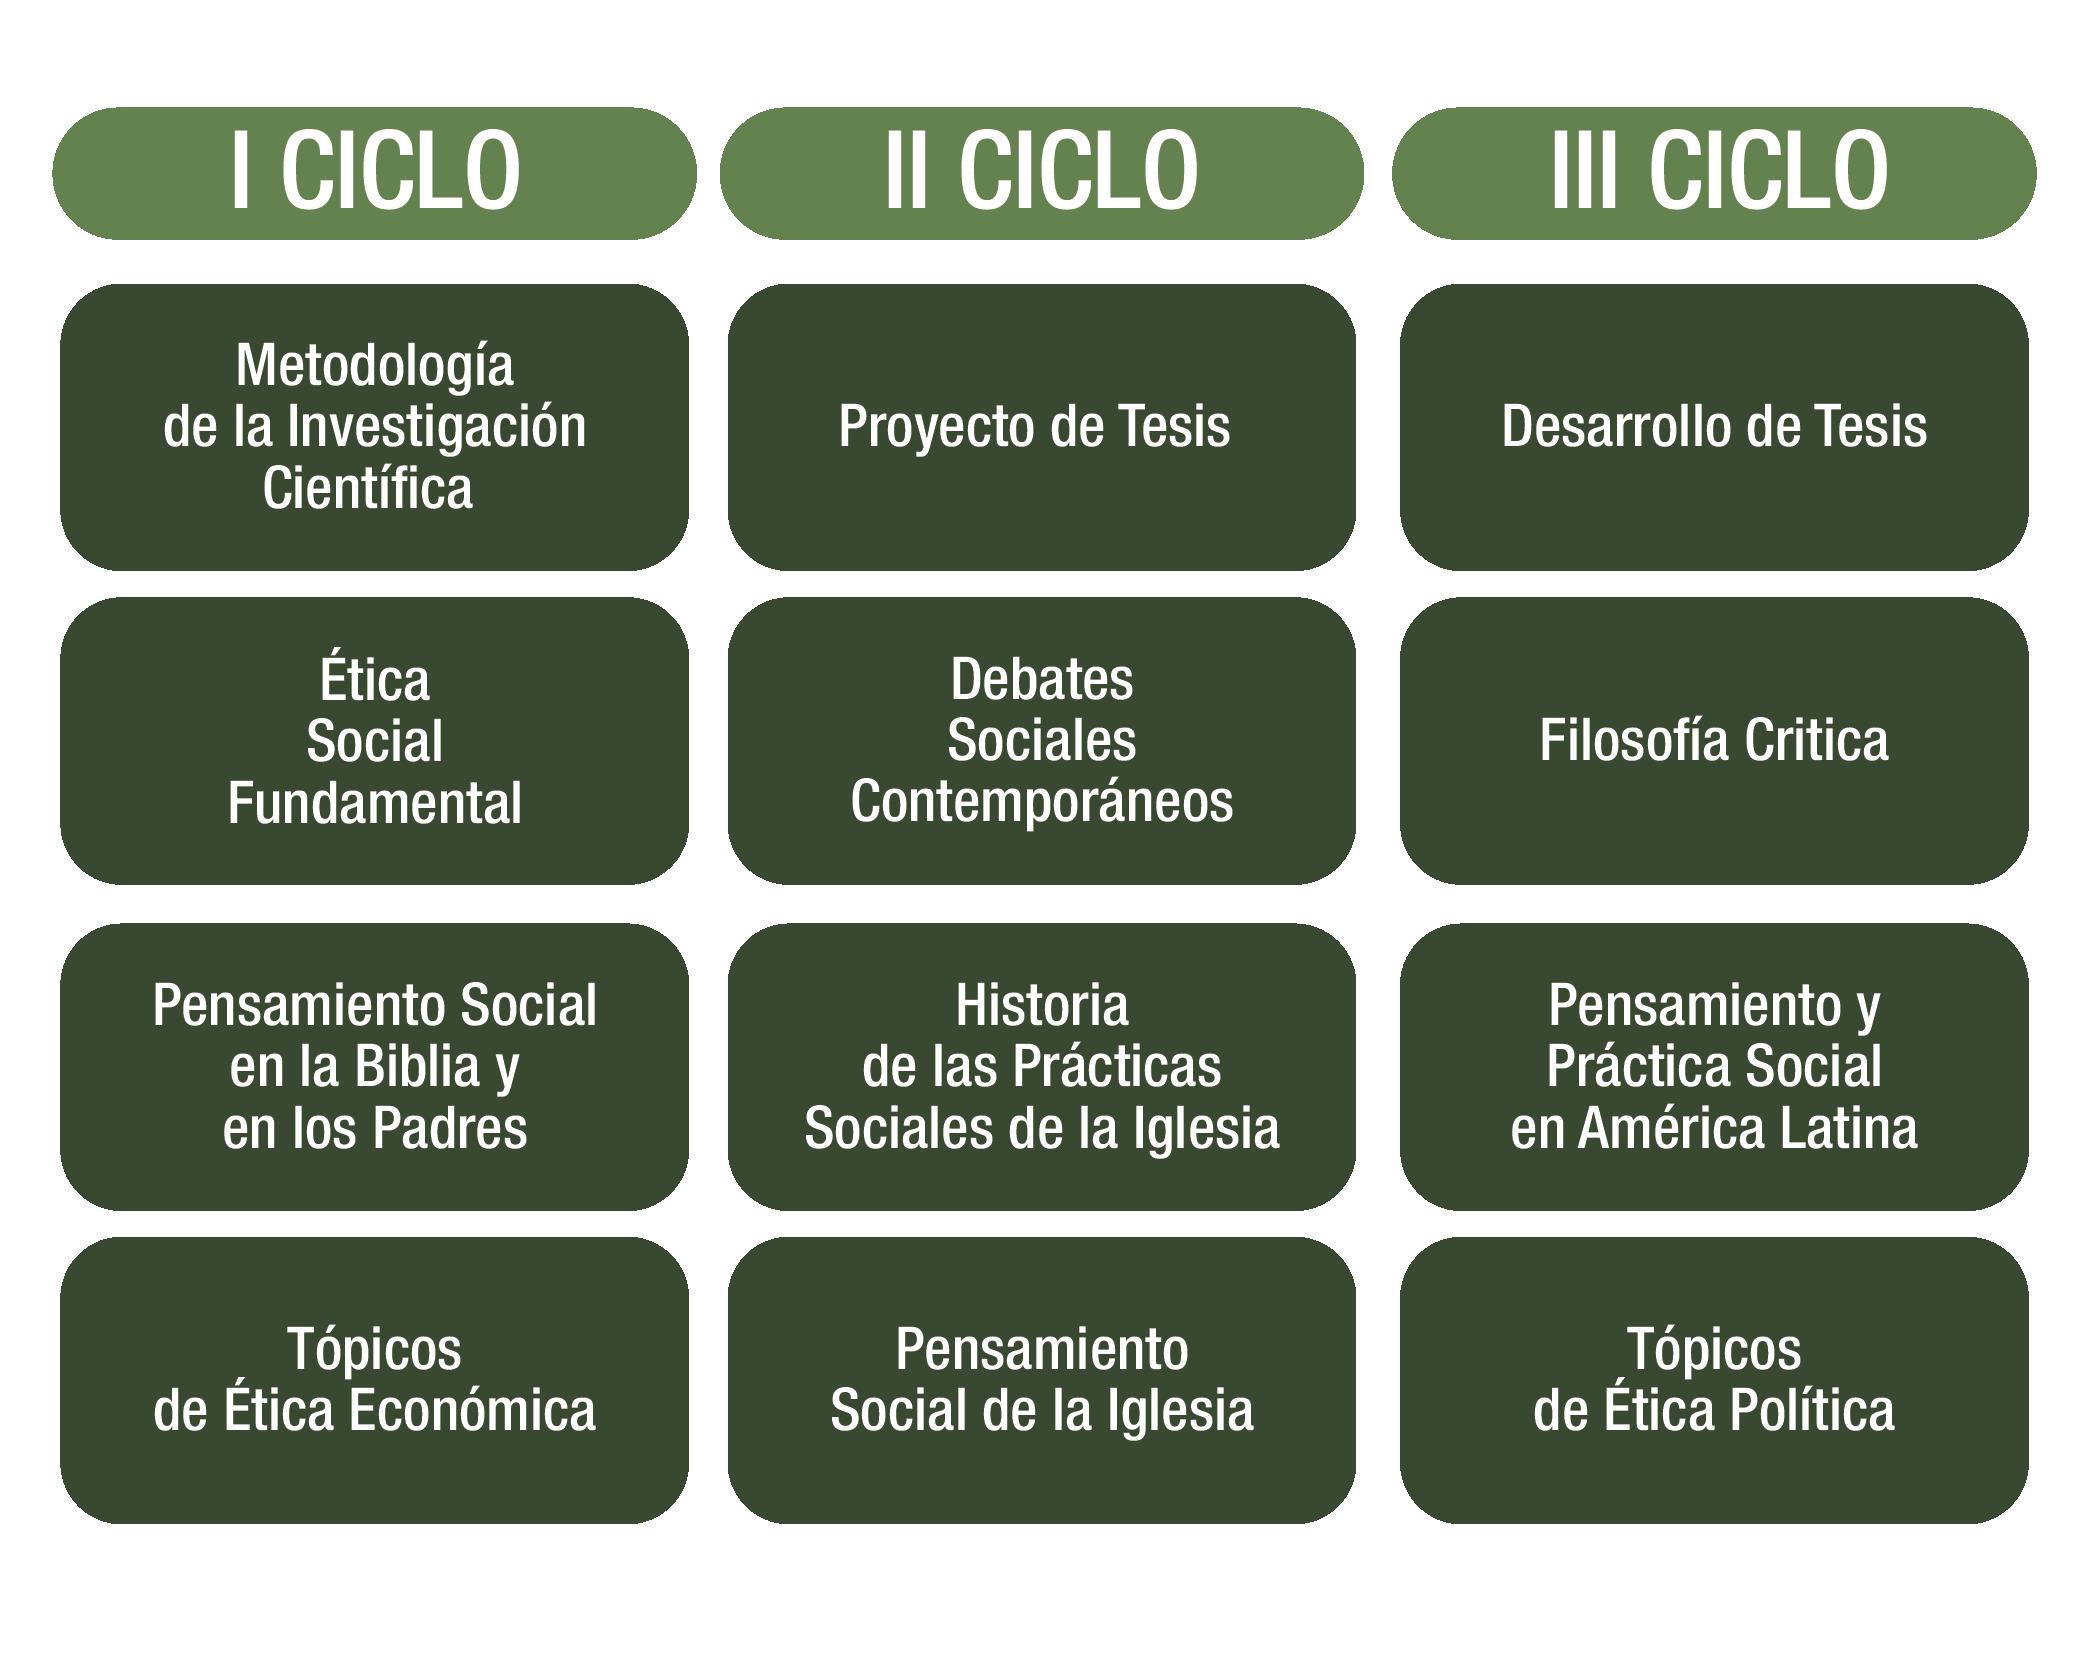 doctrina-social-de-la-iglesia_mesa-de-trabajo-1-copia